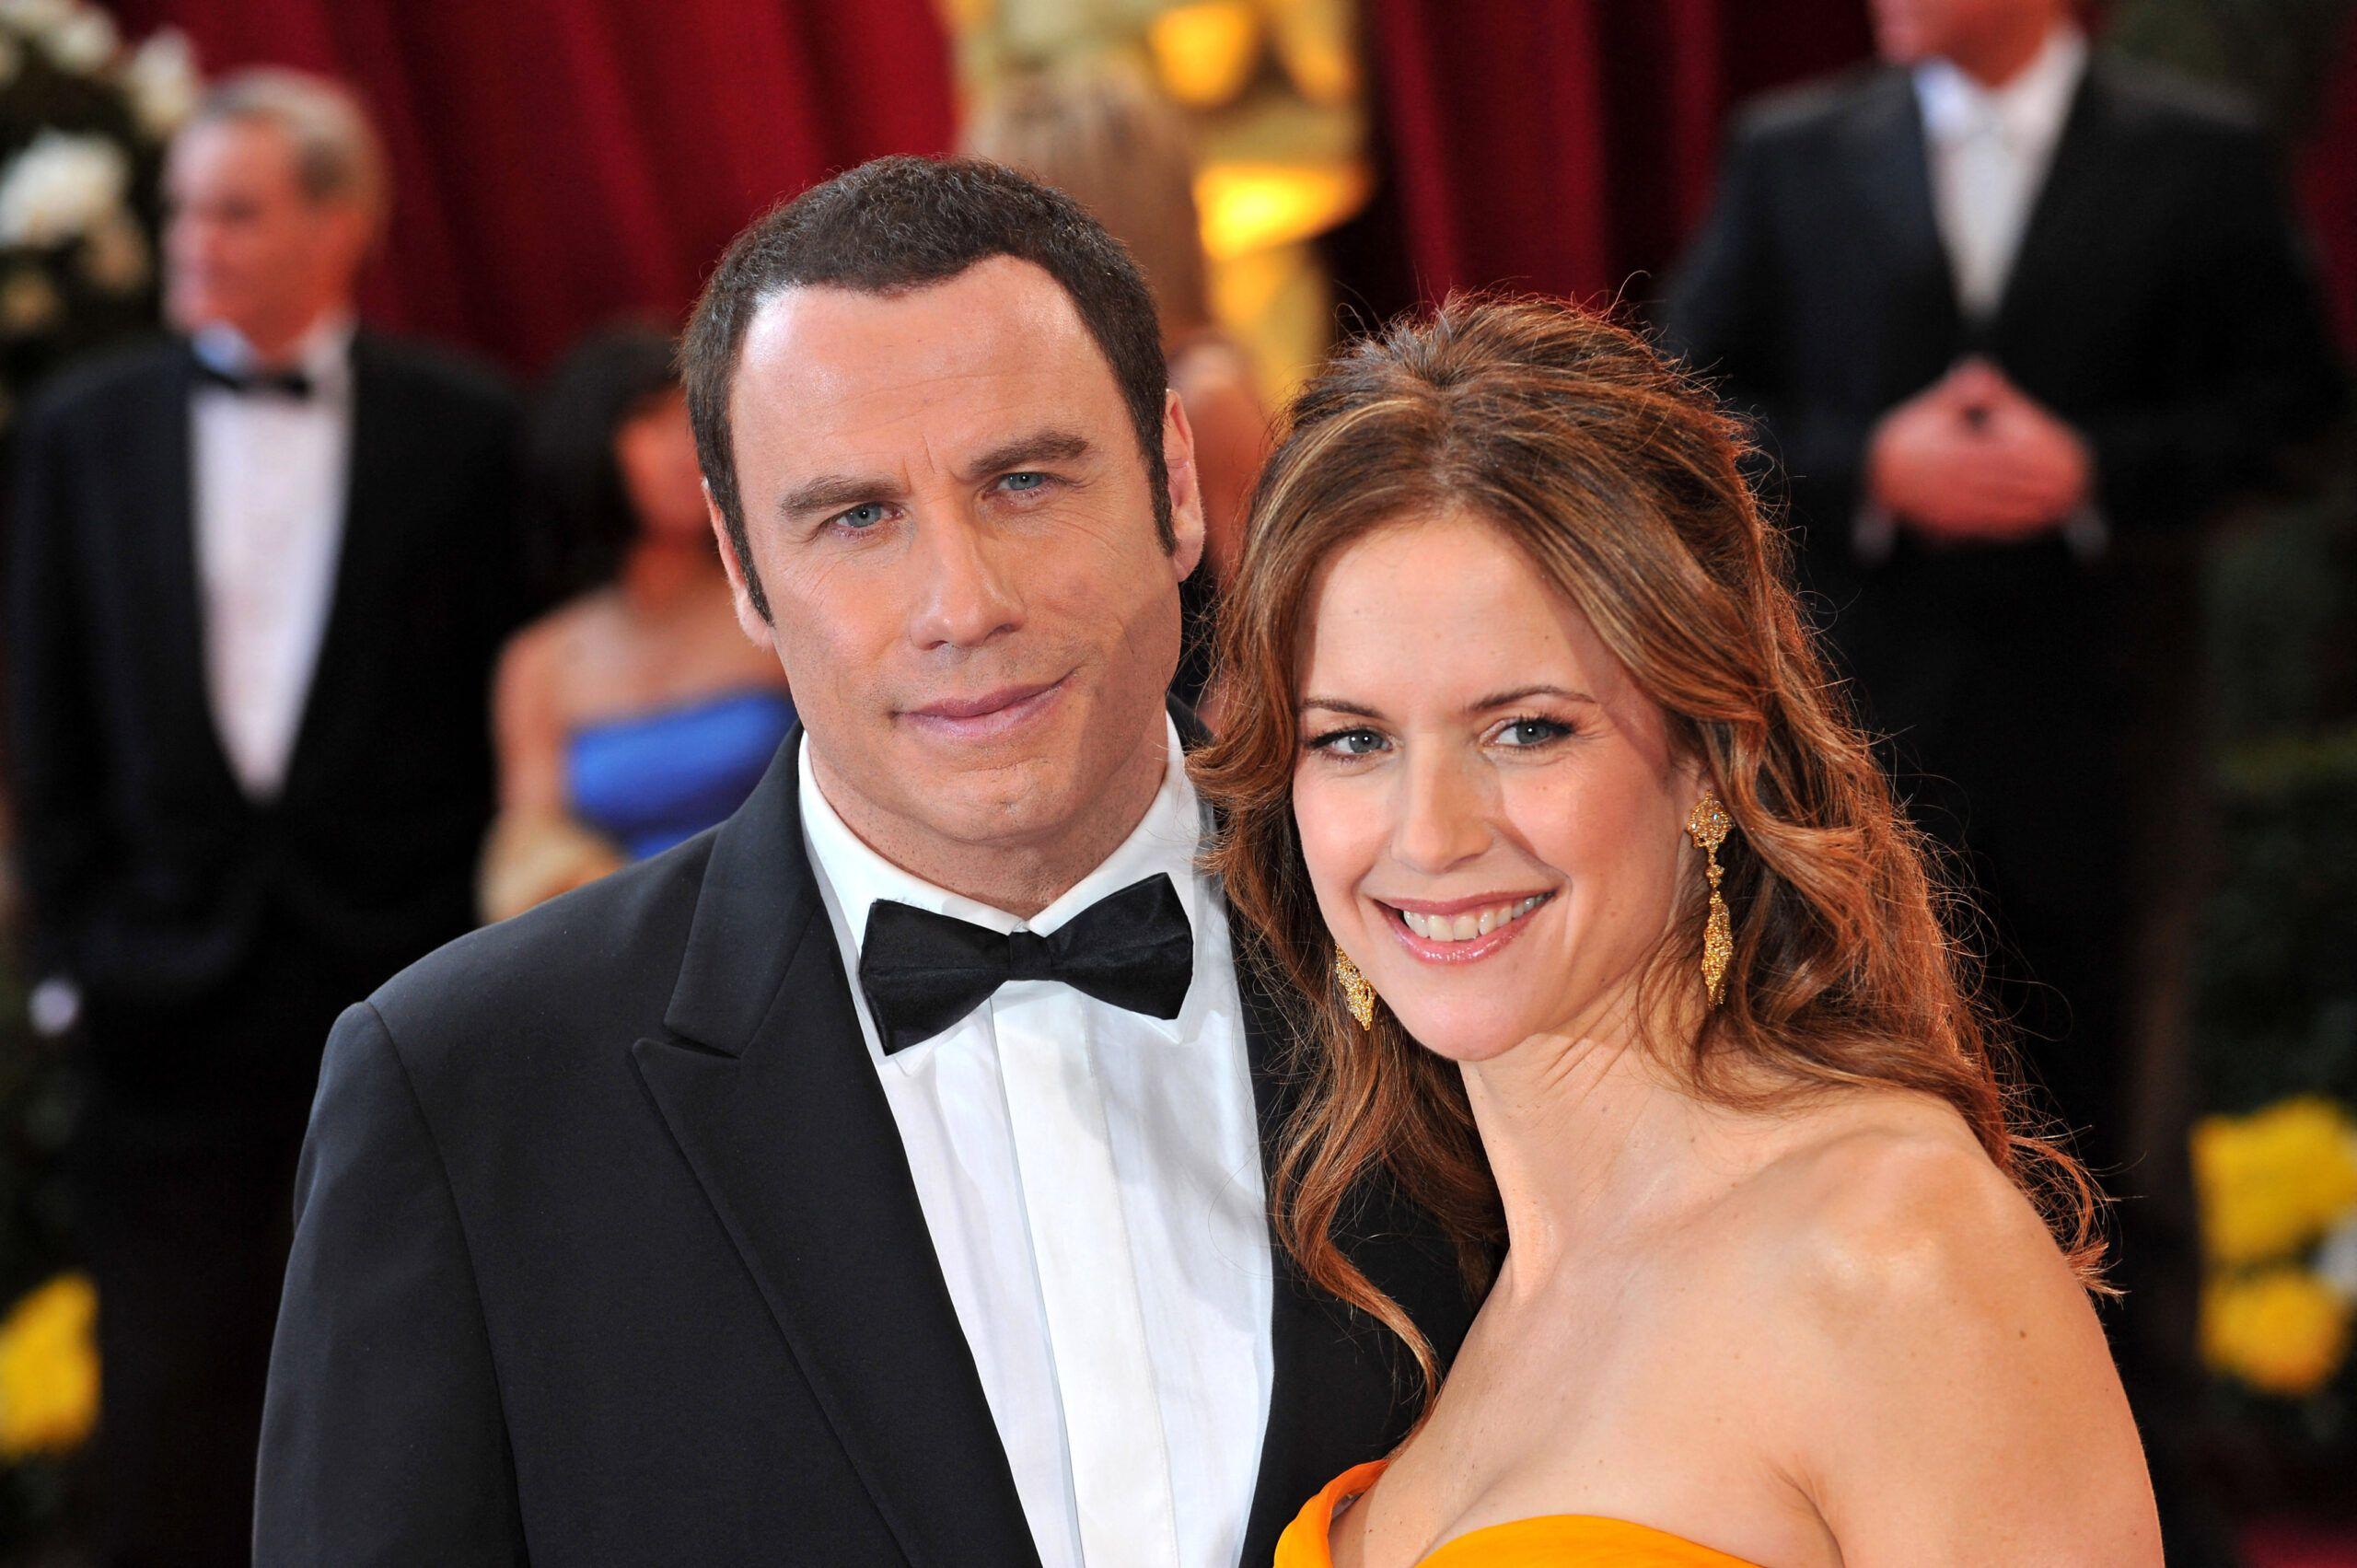 John Travolta Shares Throwback Wedding Photo To Honor Late Wife Kelly Preston's 58th Birthday